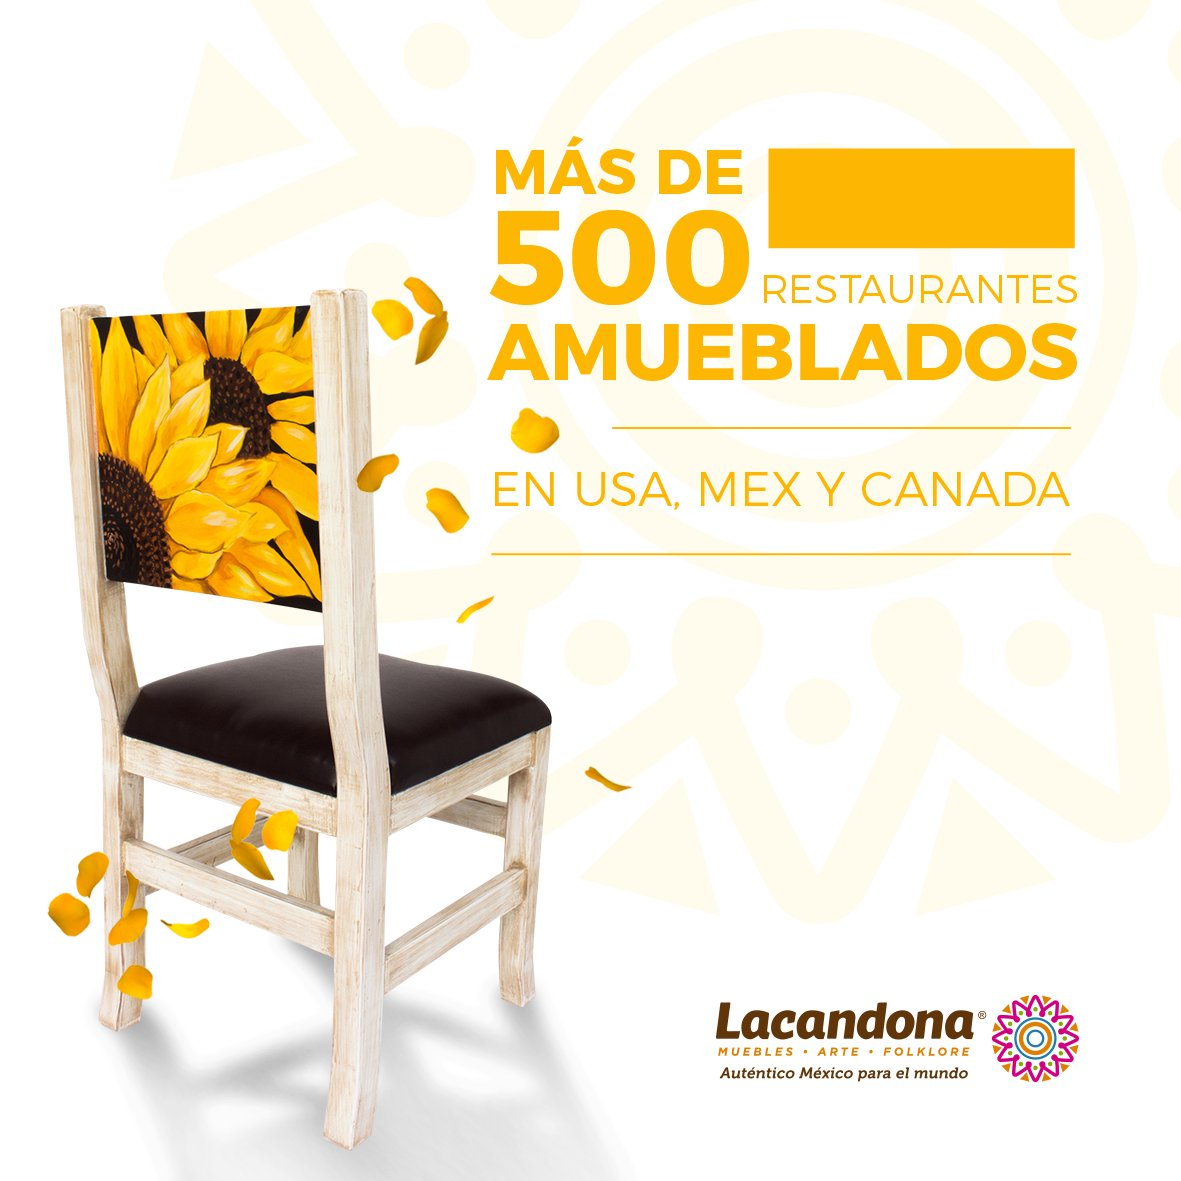 Muebles Lacandona On Twitter Orgullosamente Llevamos A M Xico  # Muebles Lacandona